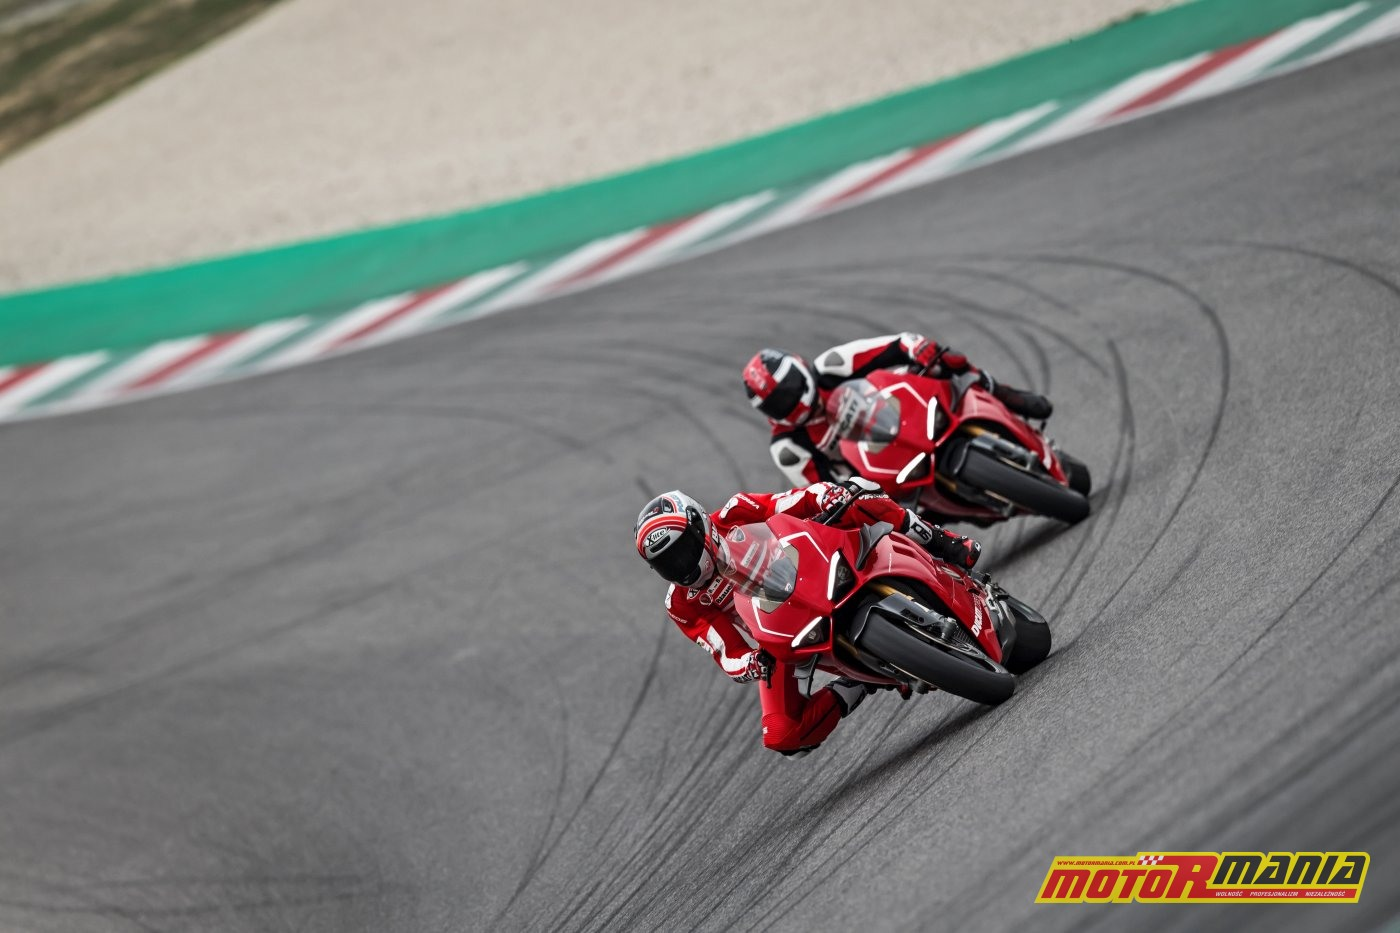 Ducati Panigale V4 R 2019 (32)